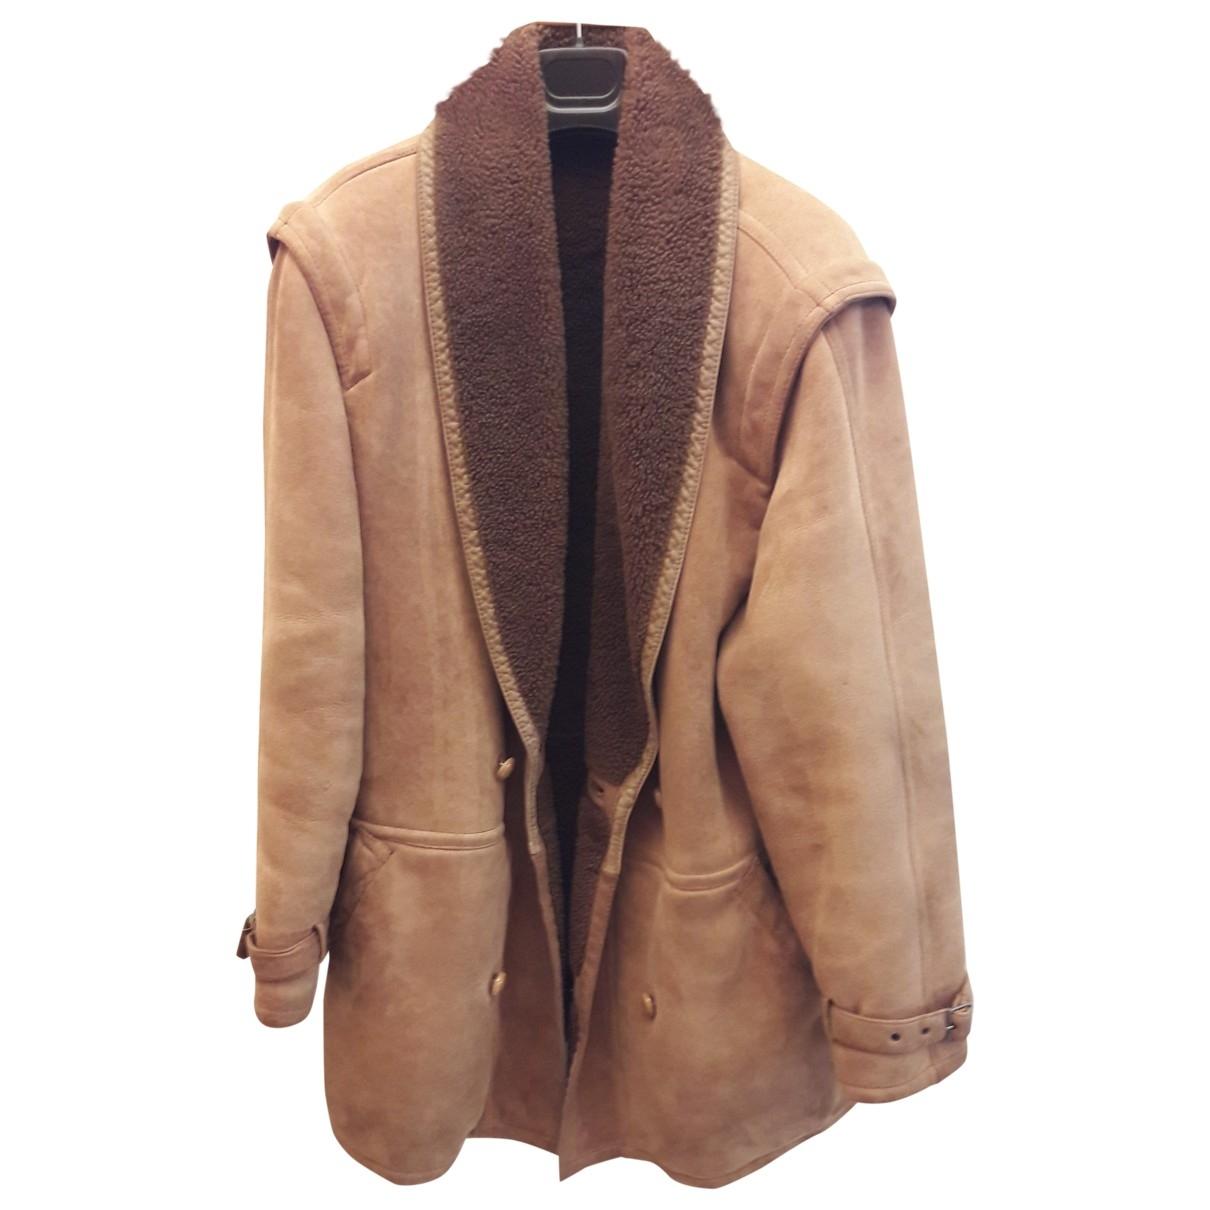 Valentino Garavani \N Beige Shearling coat  for Men 52 IT